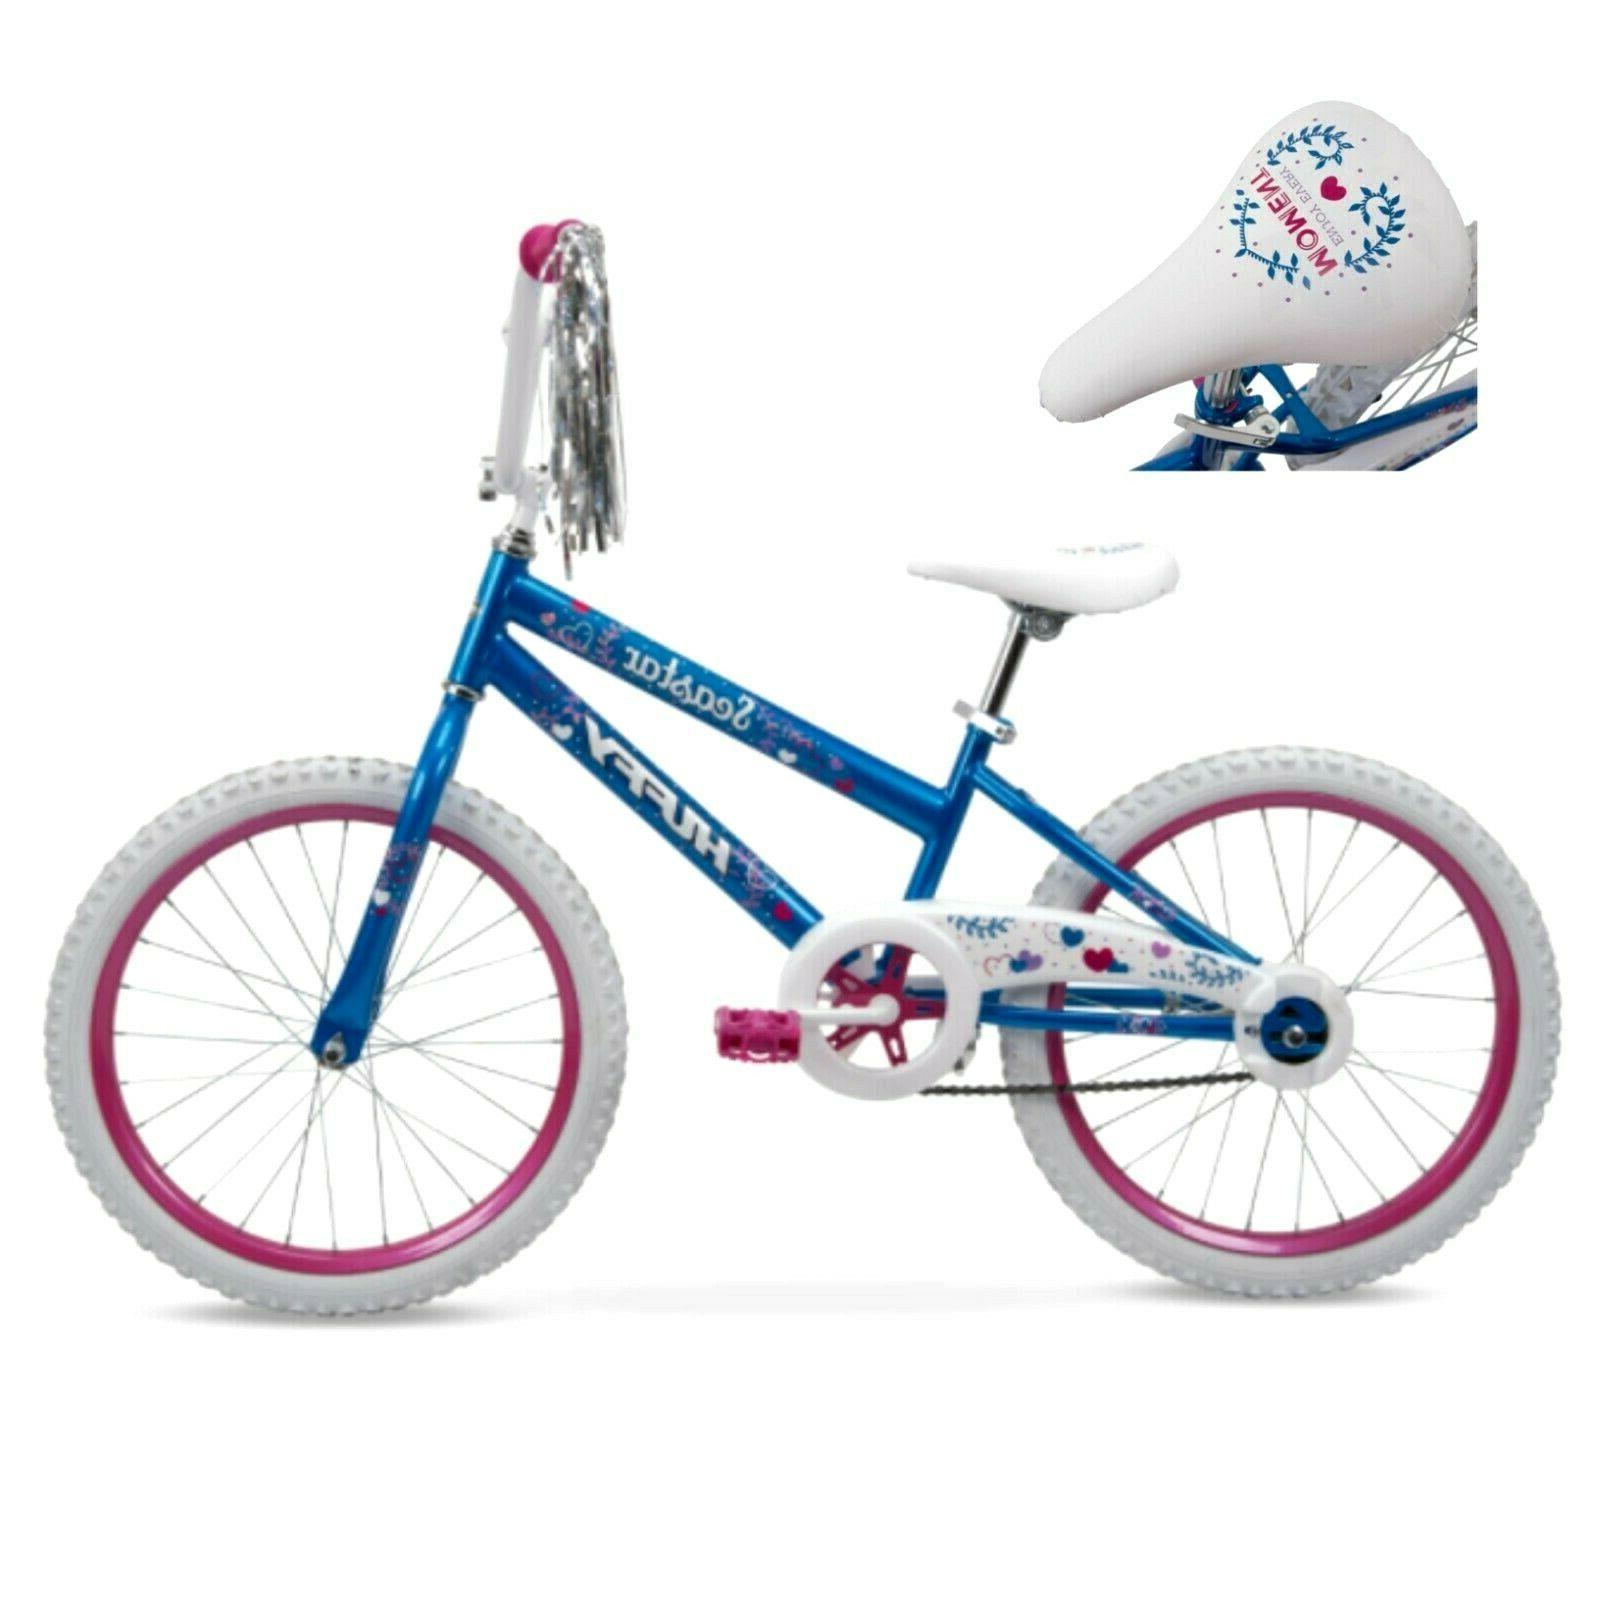 20 kids bike girls bicycle sidewalk 20